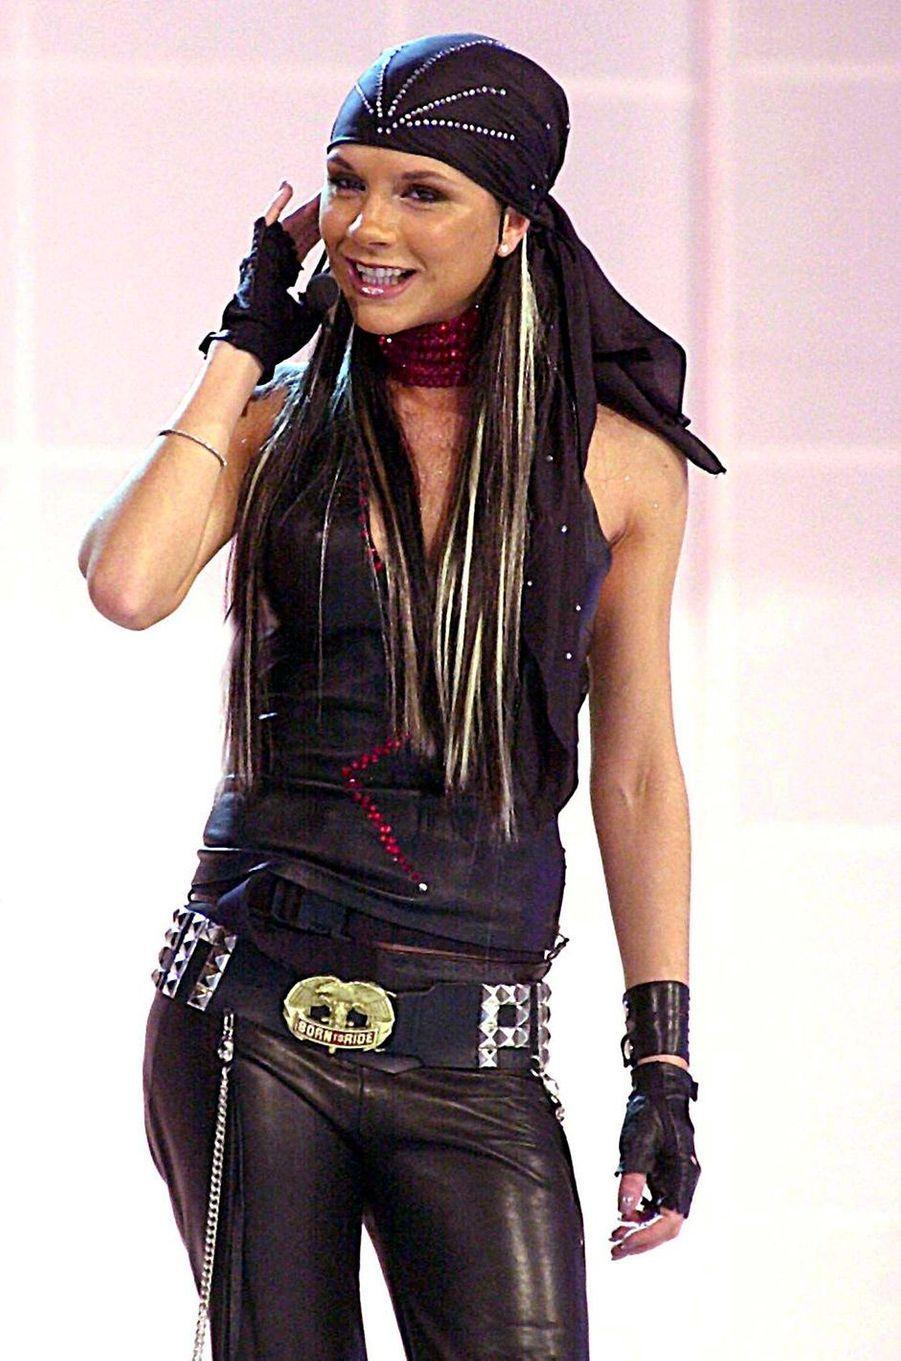 Victoria Beckham, aka Posh Spice, le 7 octobre 2001